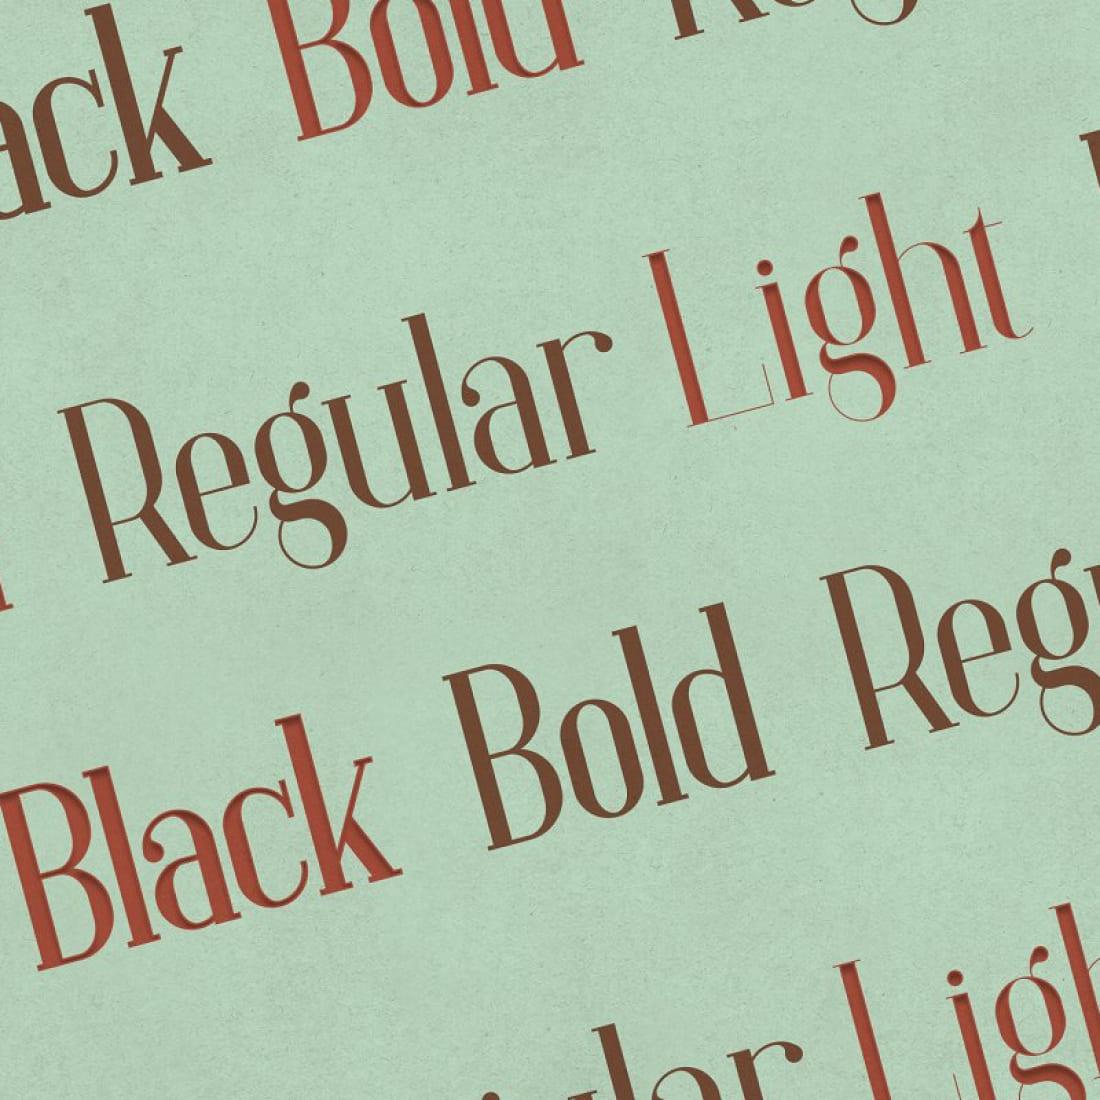 Baleine – Slab Serif Font 4 weights cover image.